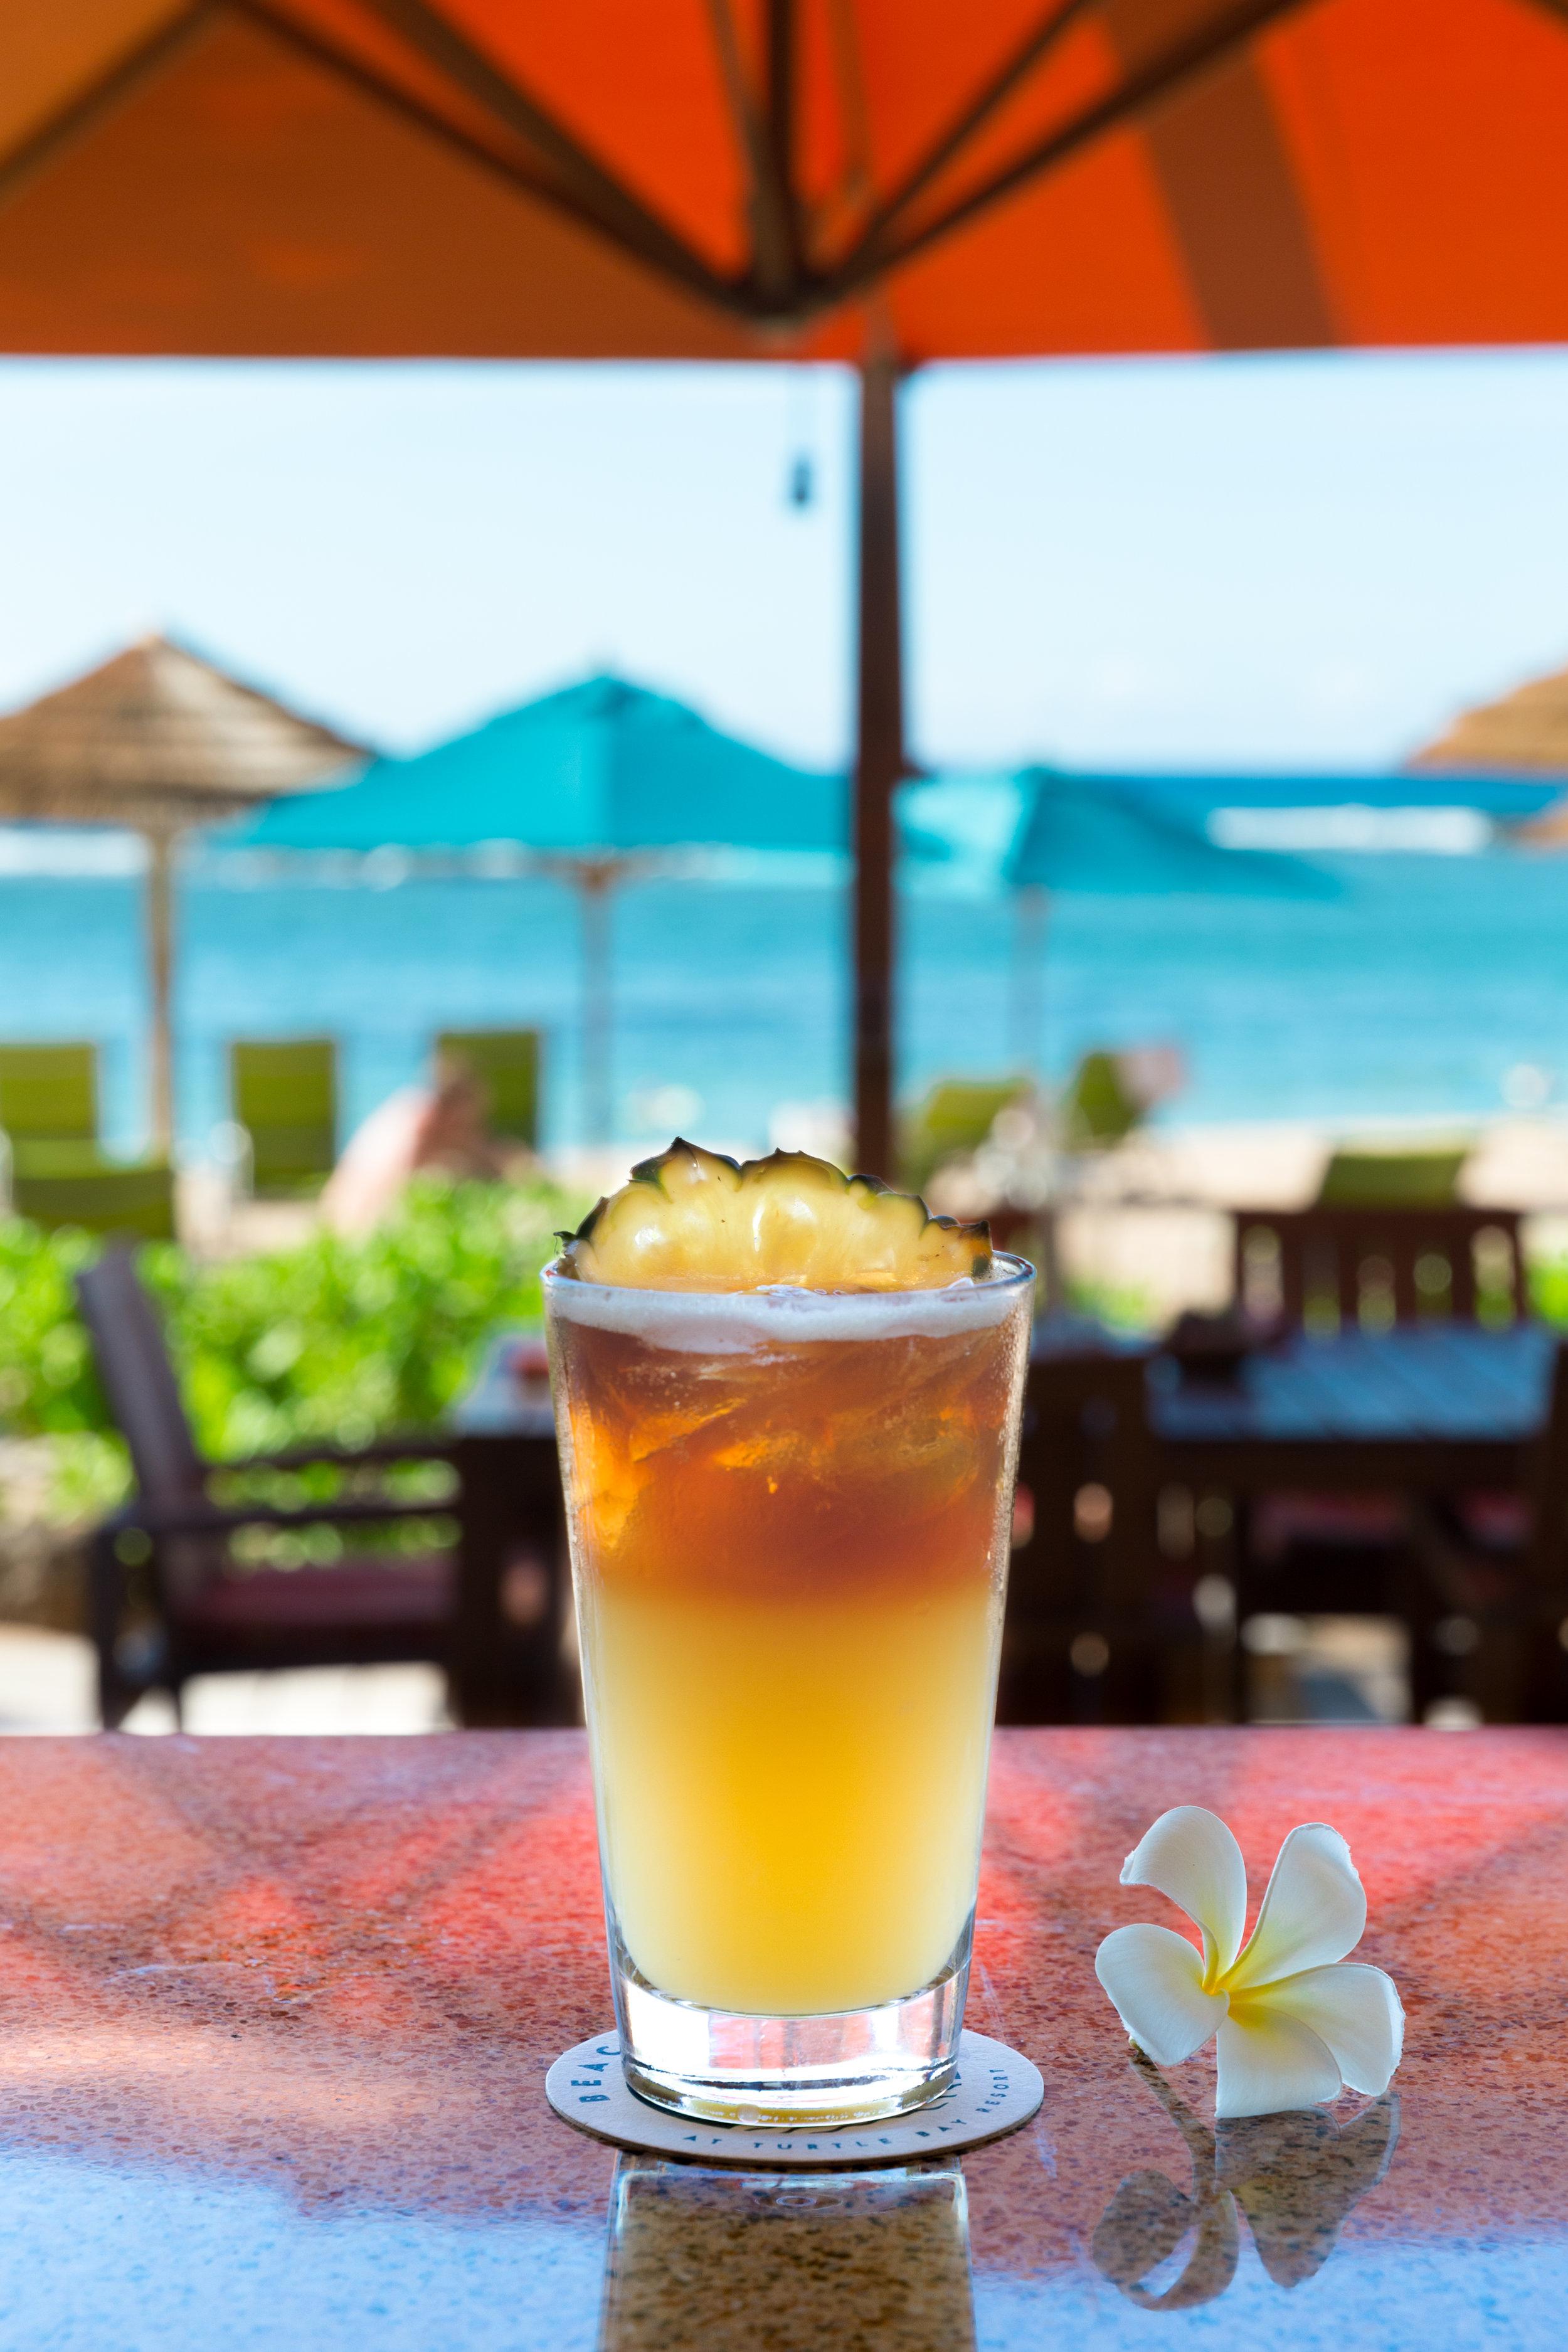 Roy's Beach House_Beach House Spiced Mai Tai – Koloa Spiced Rum, Ginger, Pineapple, Koloa Dark Rum Float__pc Craig Bixel_07-2017.jpg